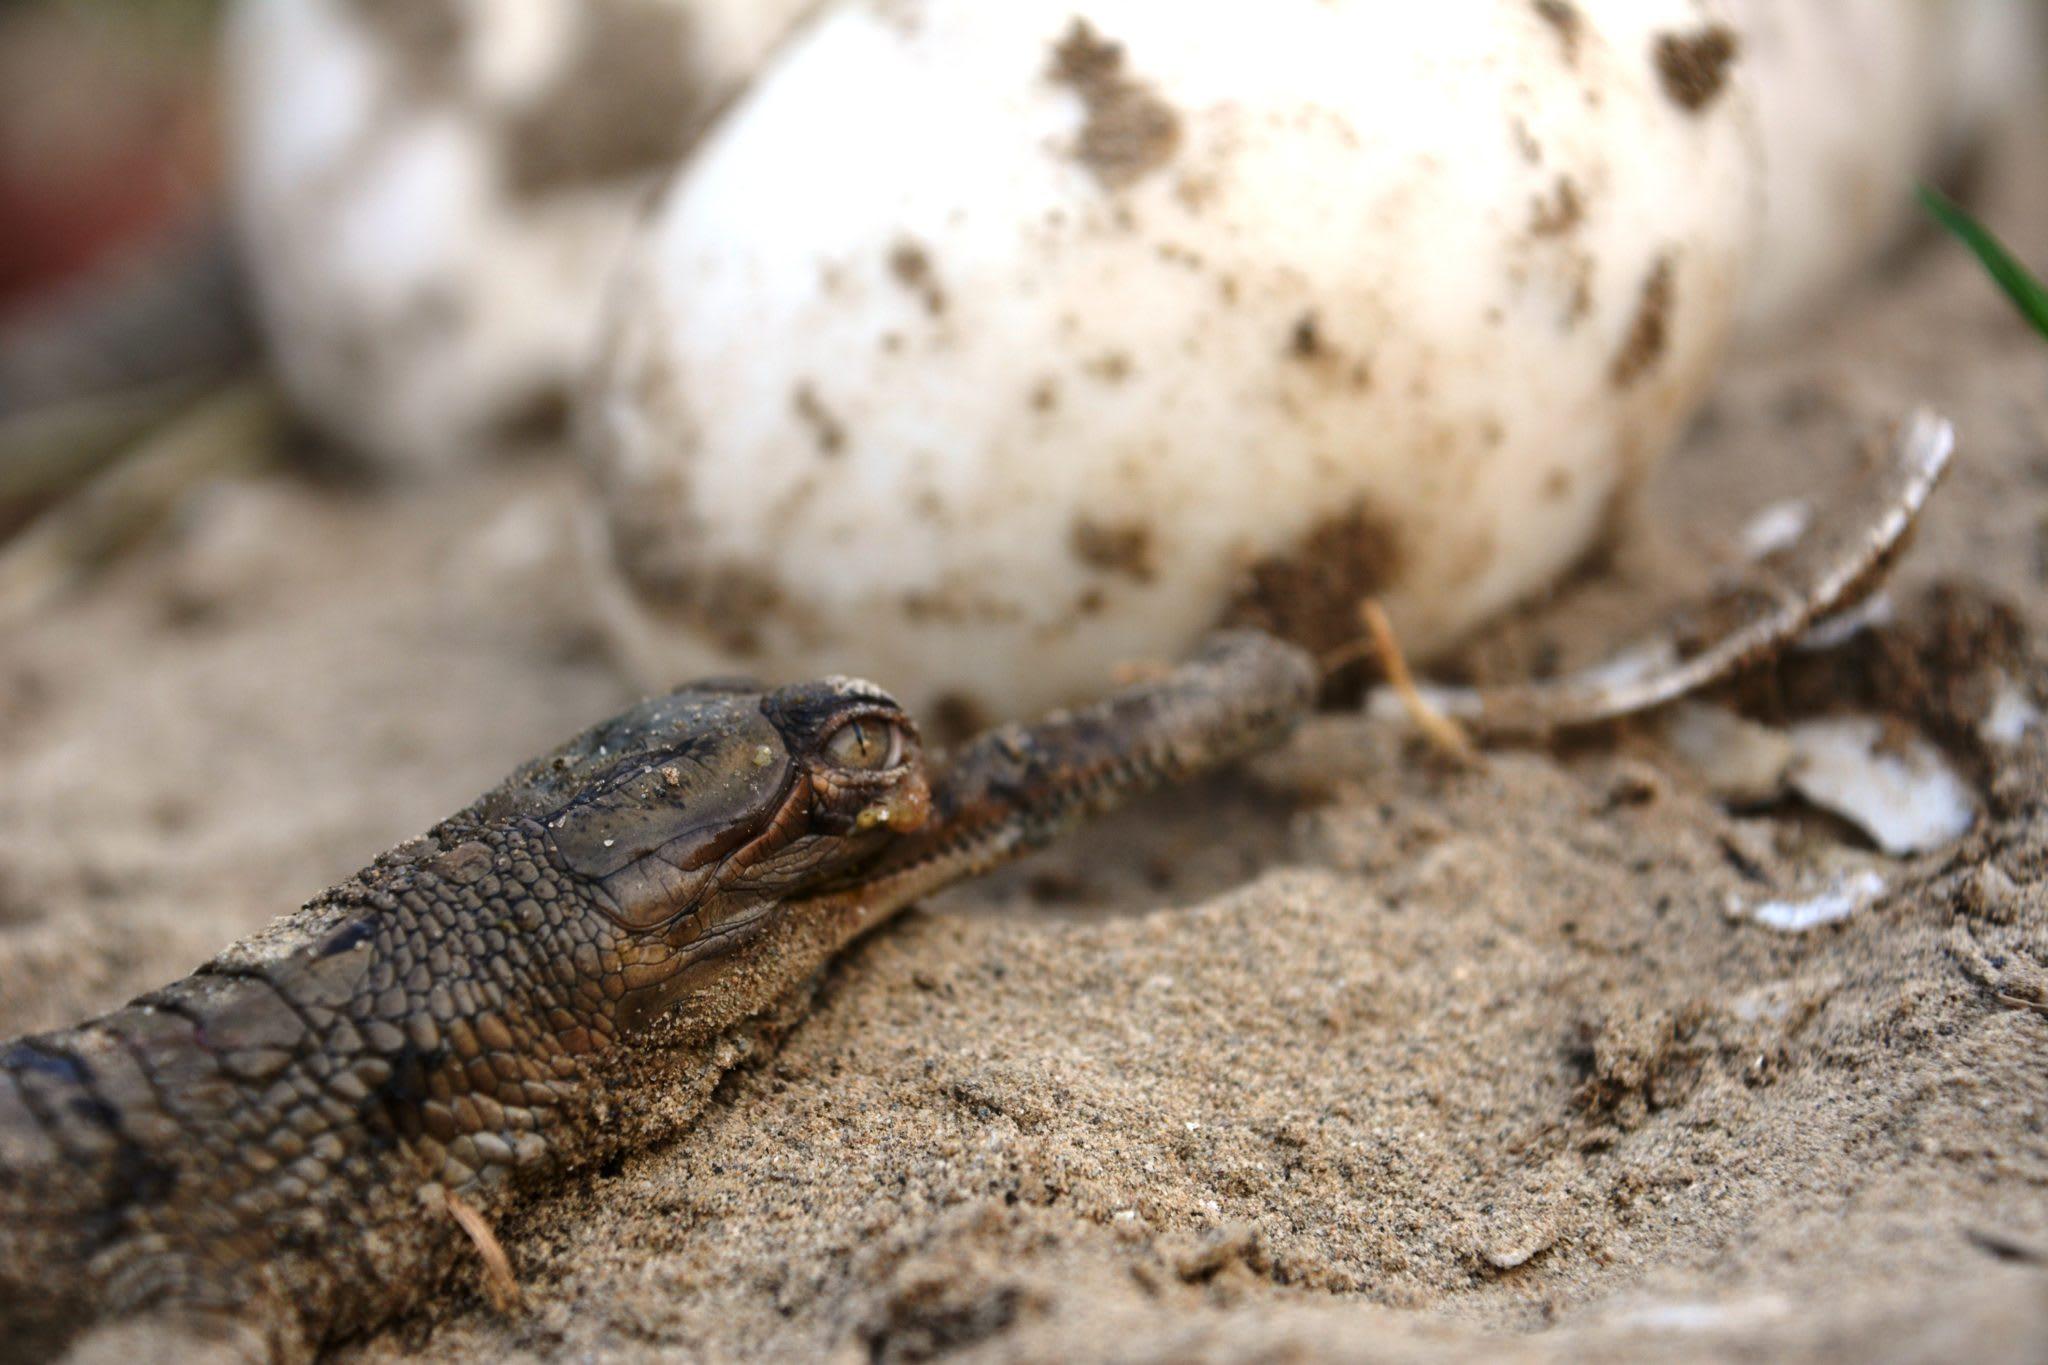 A gharial hatchling. Photo: Gaurav Vashistha